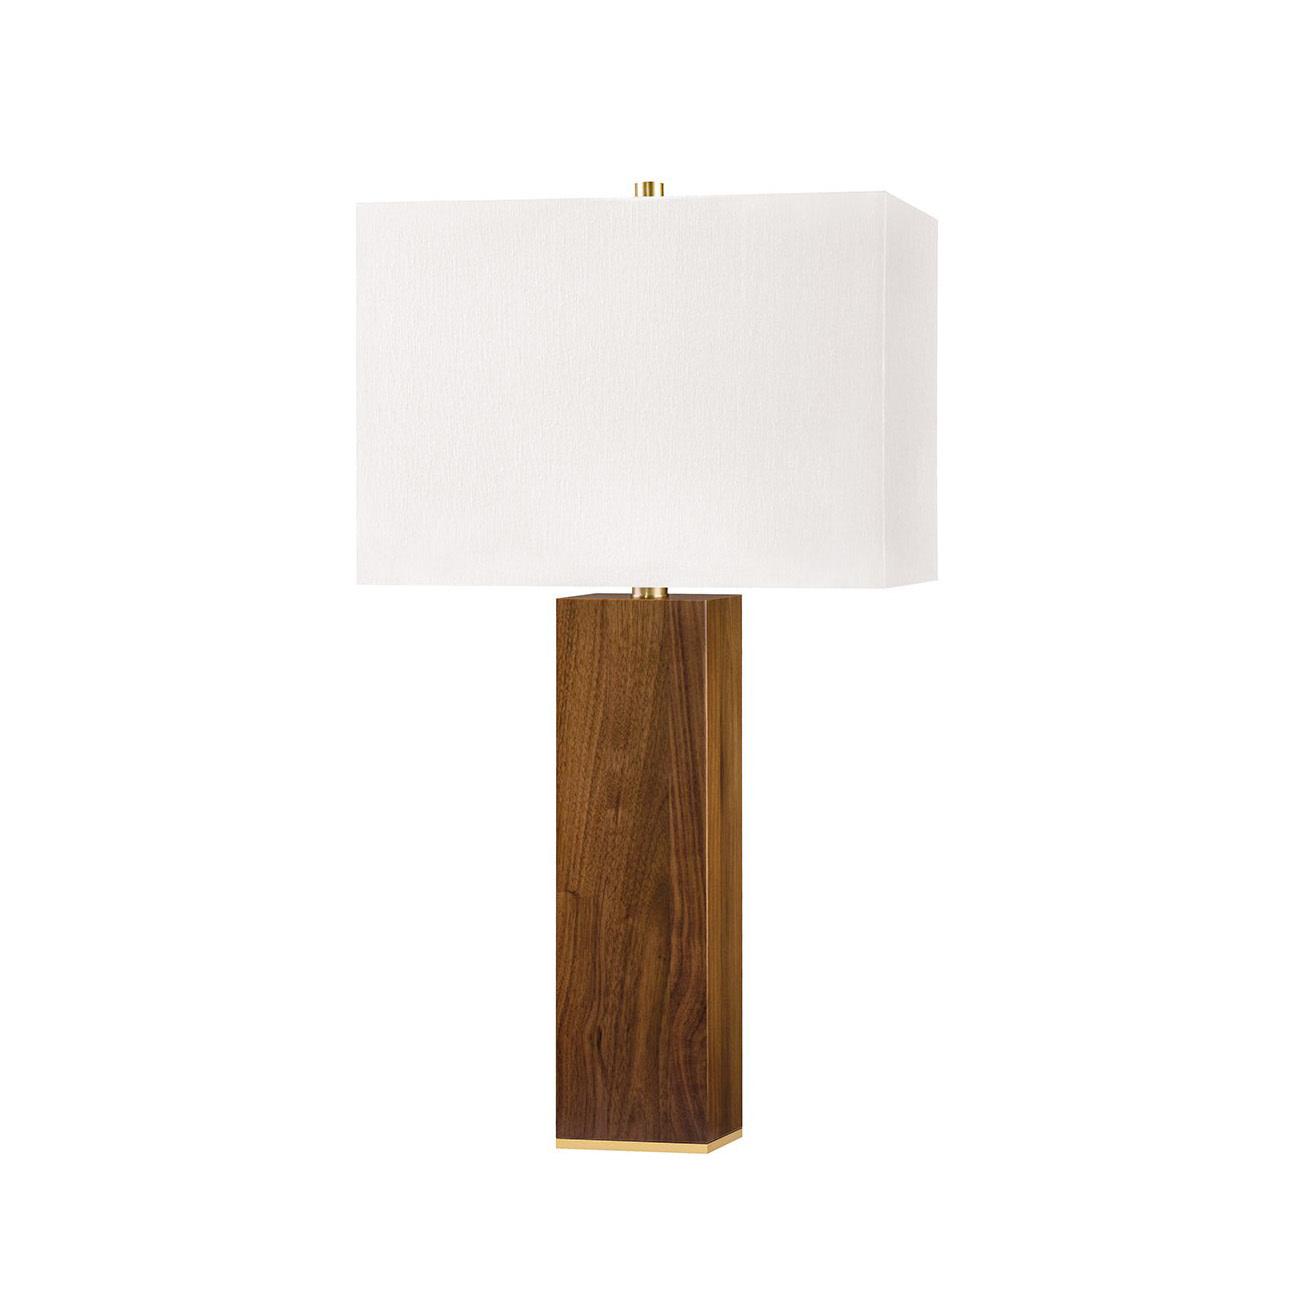 Waltham Table Lamp